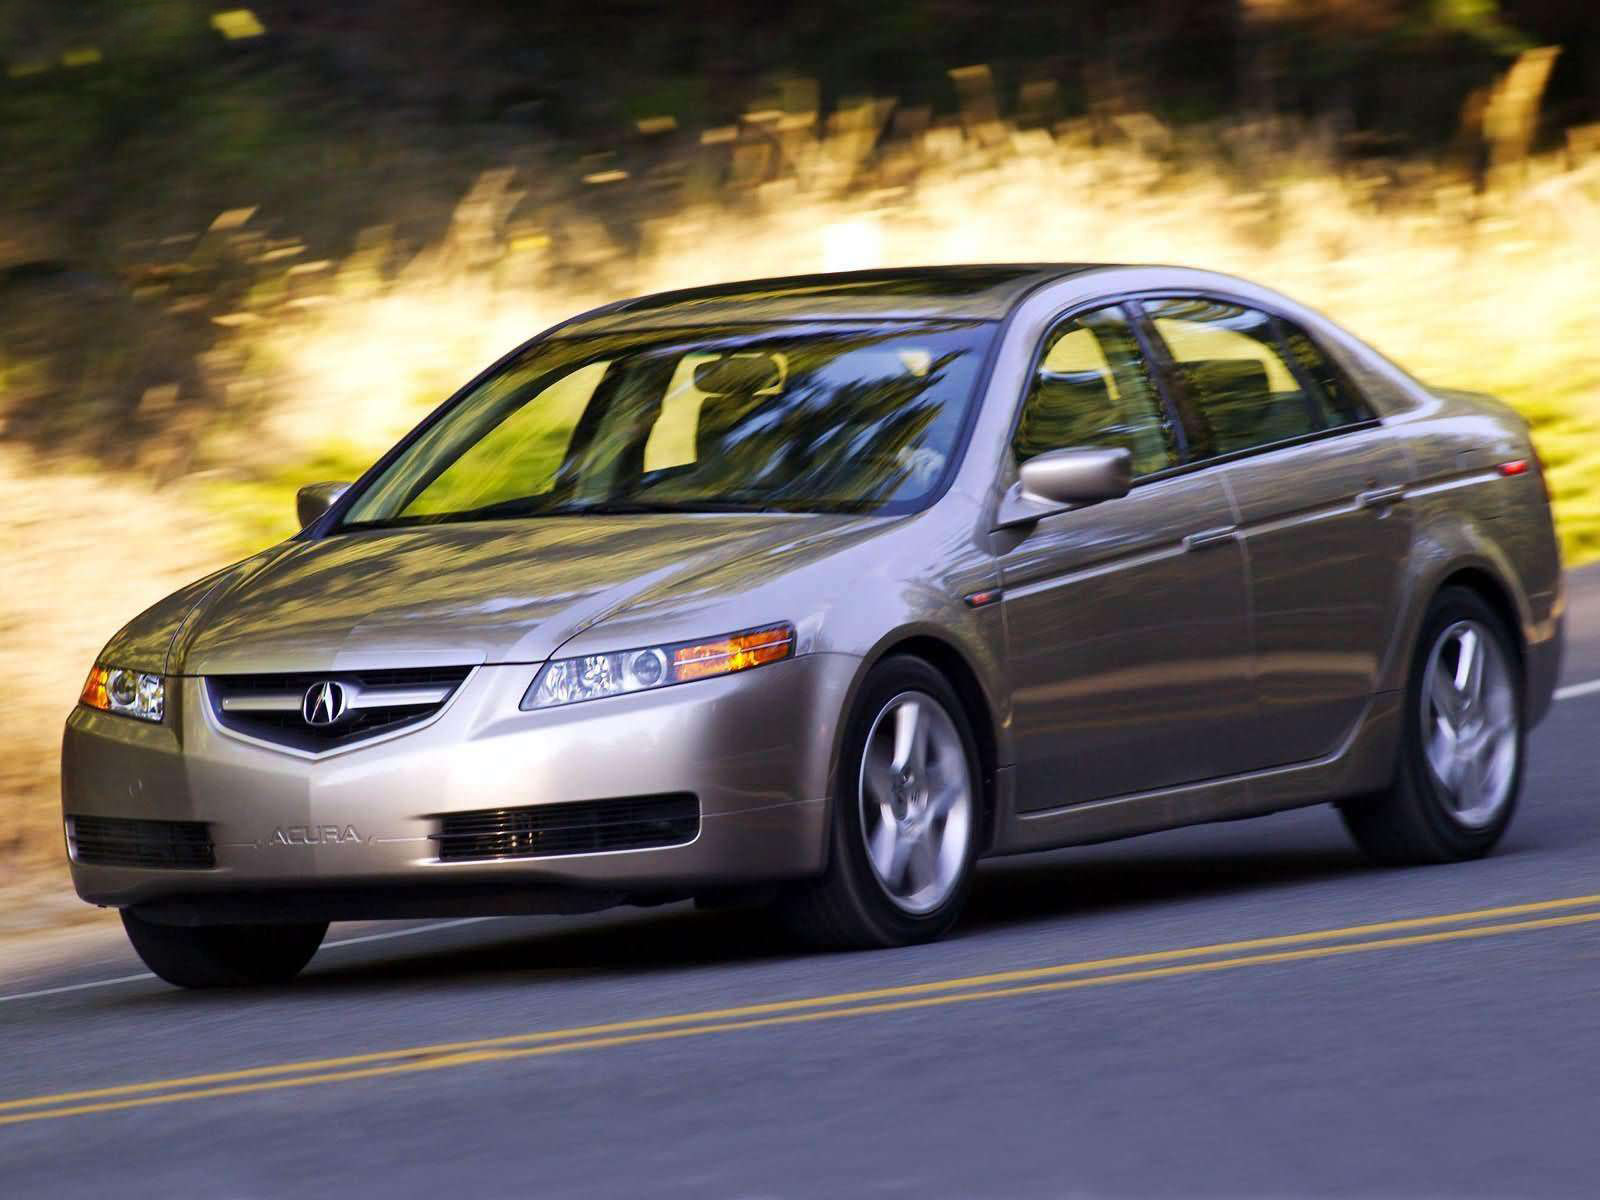 2004 ACURA 32 TL car desktop wallpaper  Auto Trends Magazine